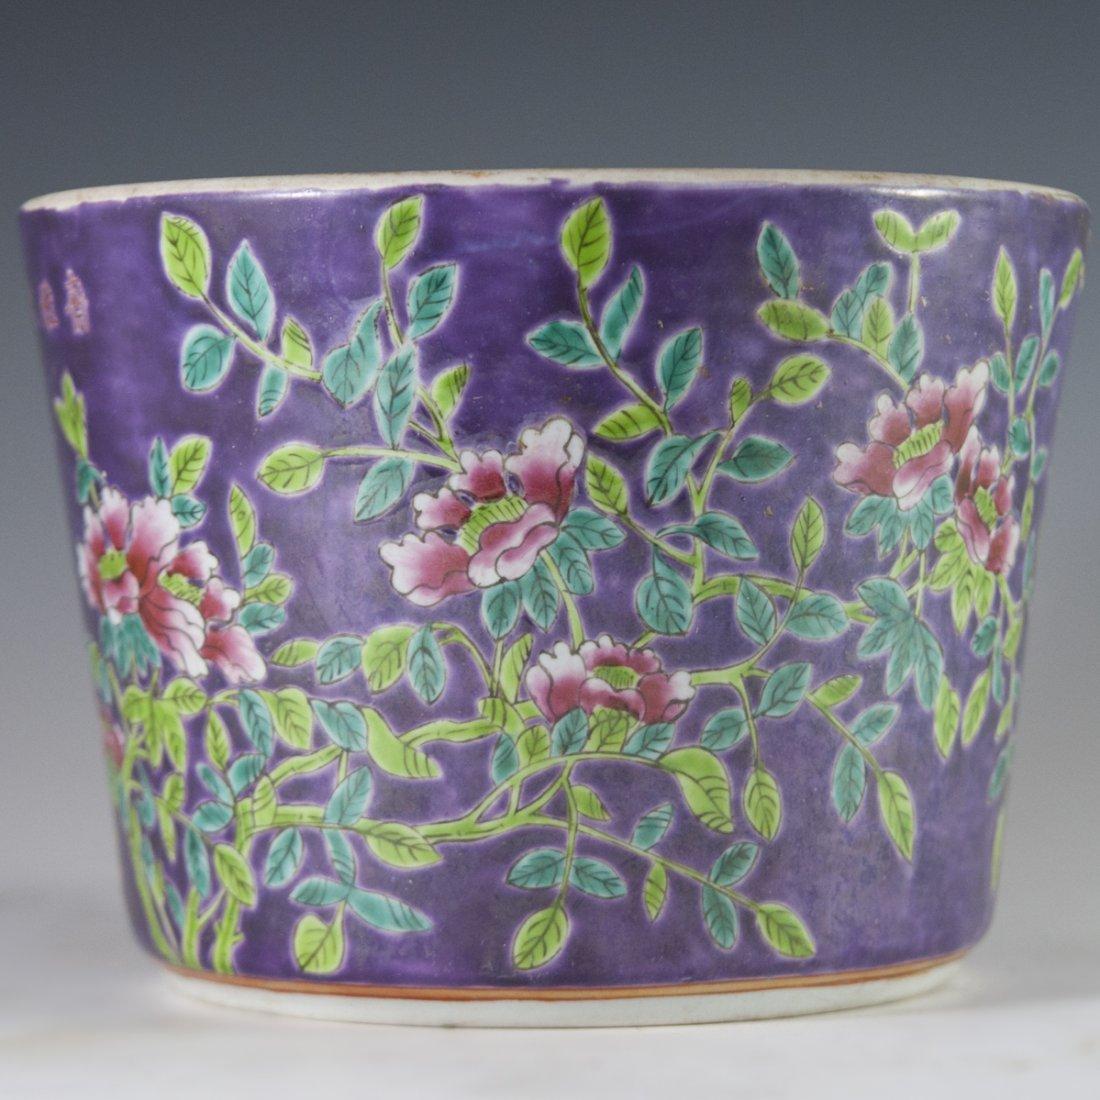 Chinese Porcelain Daya Zhai Cache Pot